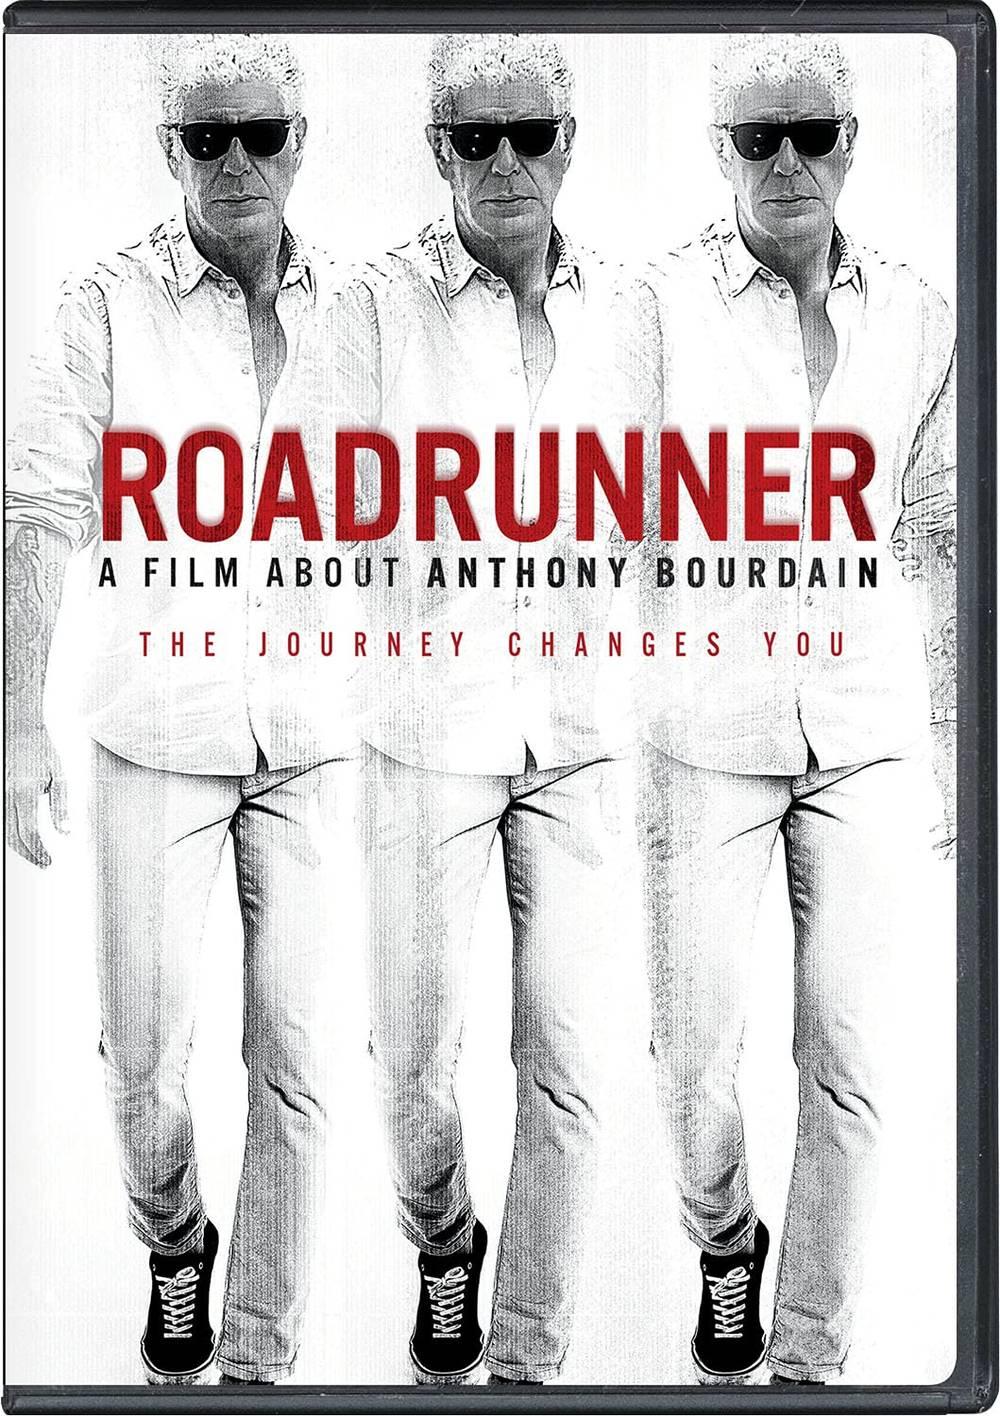 Anthony Bourdain - Roadrunner: A Film About Anthony Bourdain